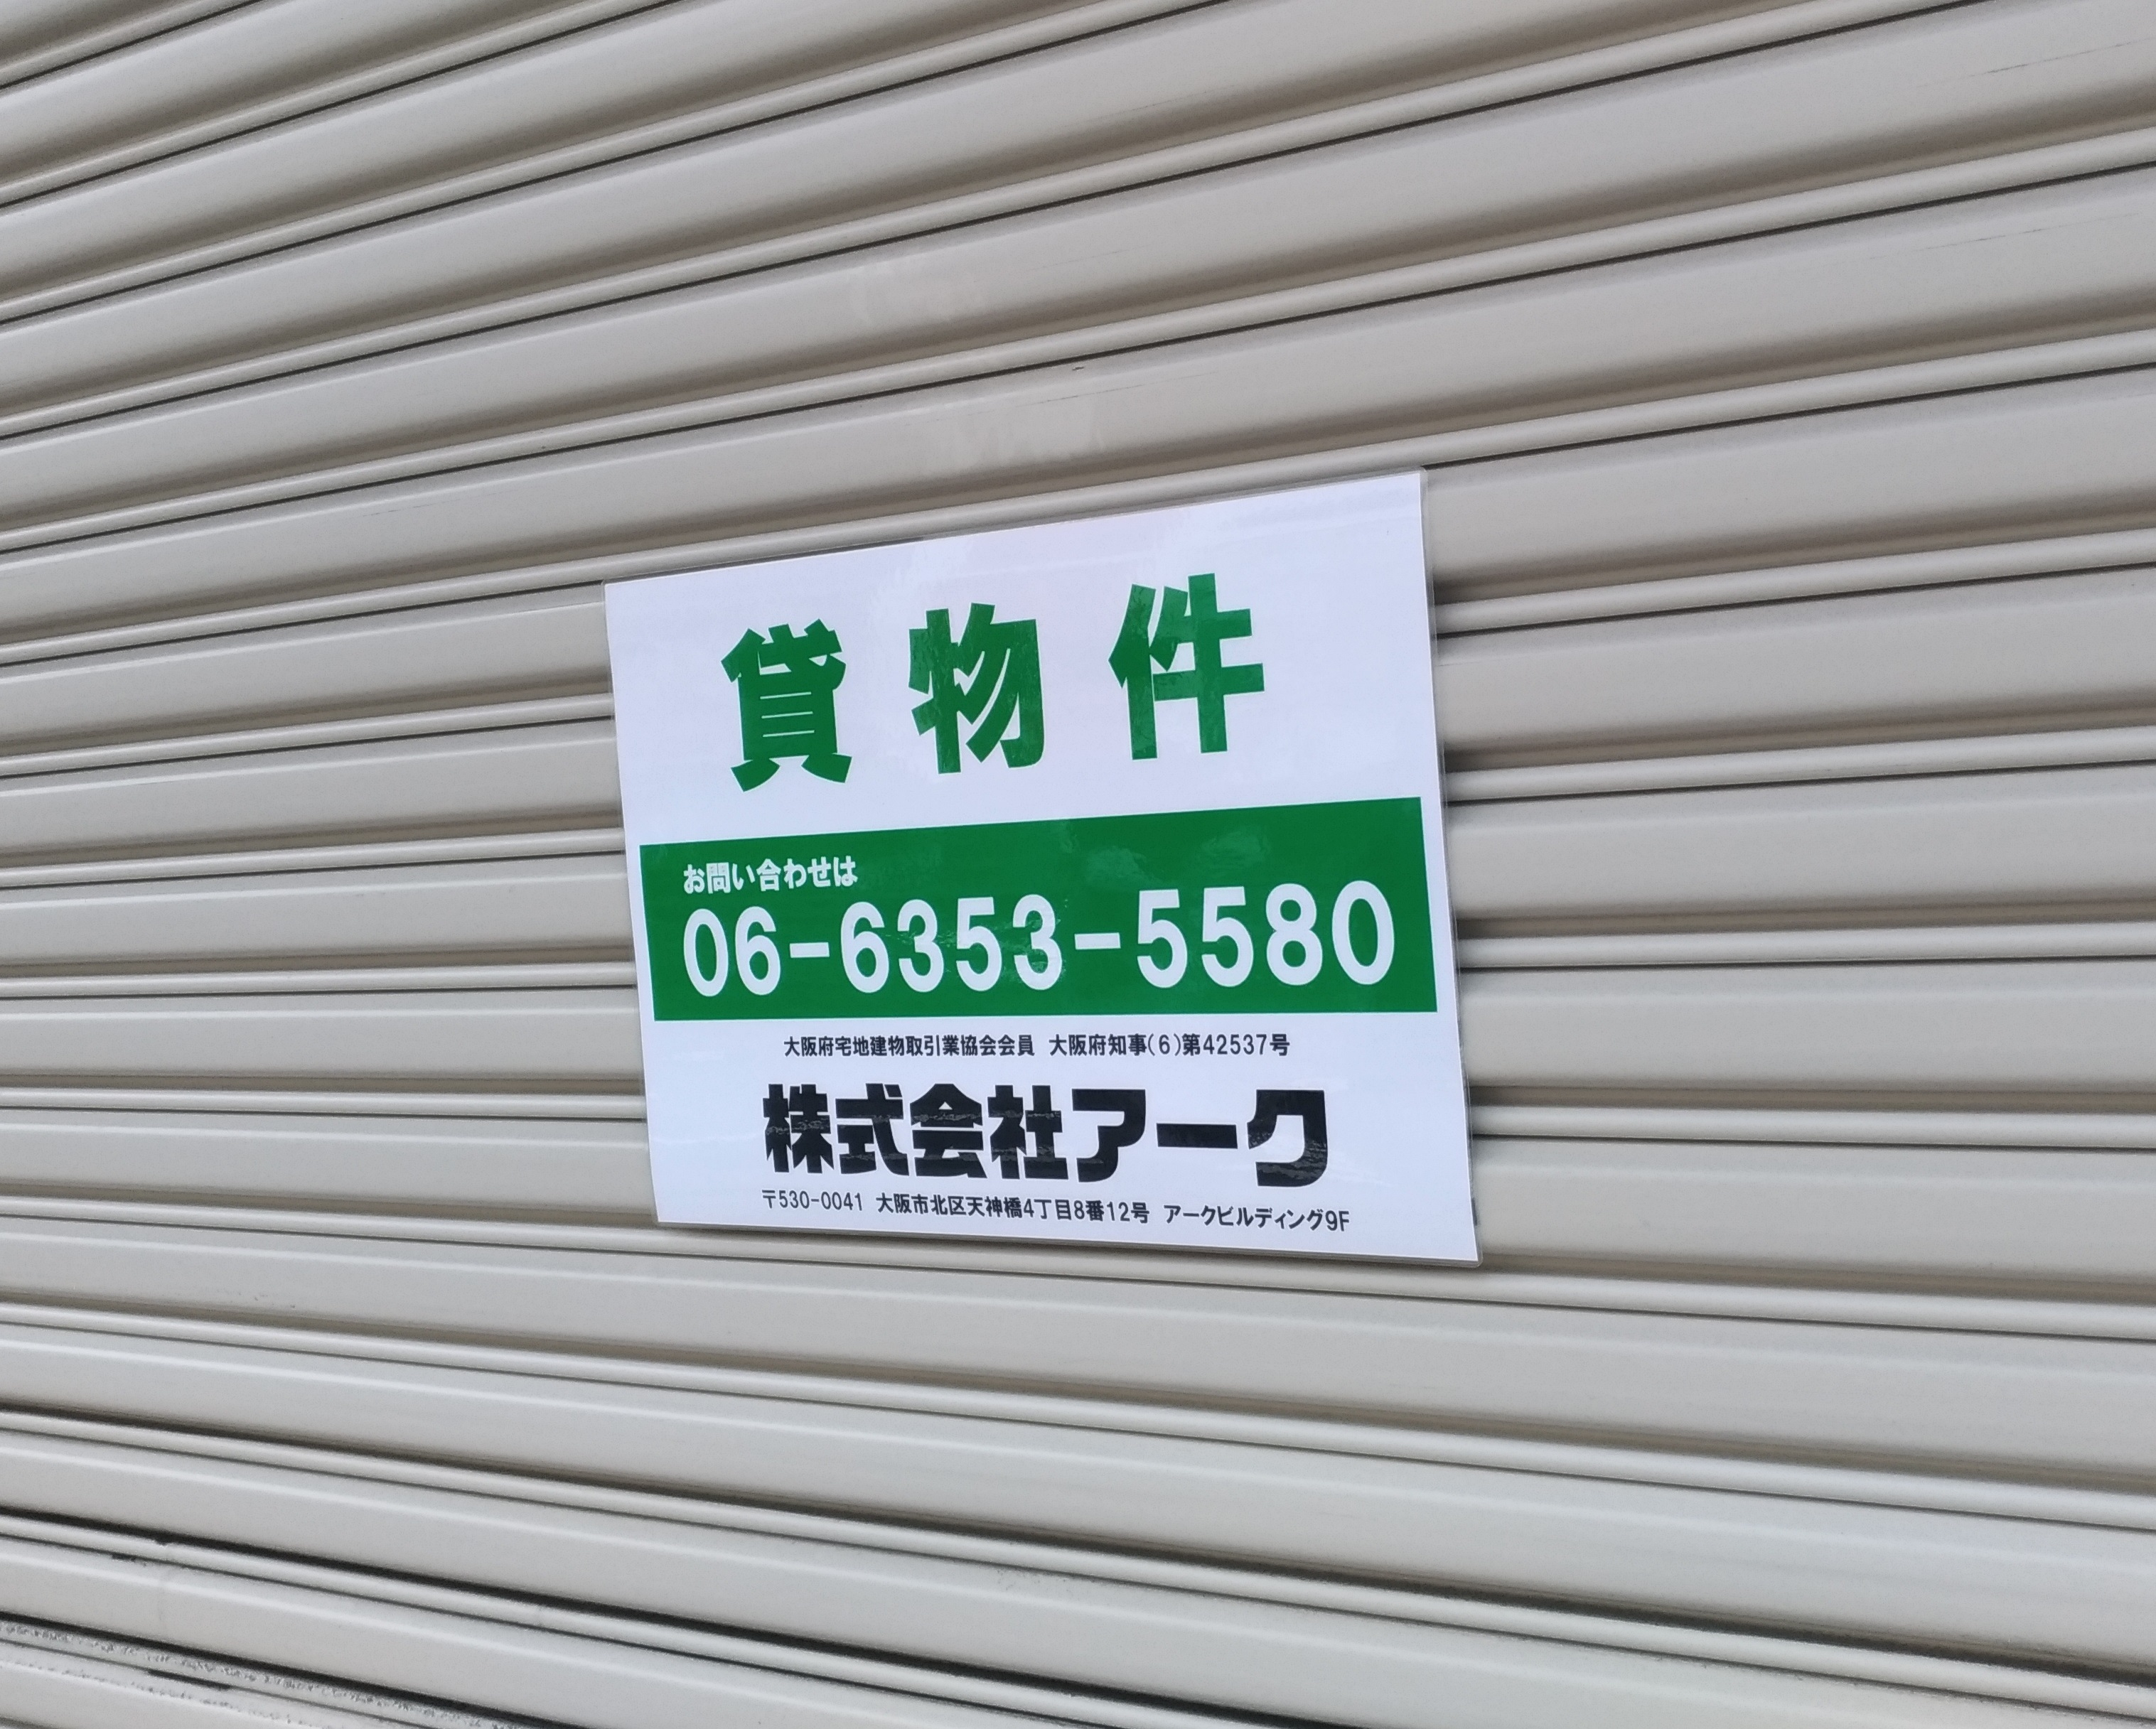 ikinari_staki_osaka_tenma_close_0504_.jpg